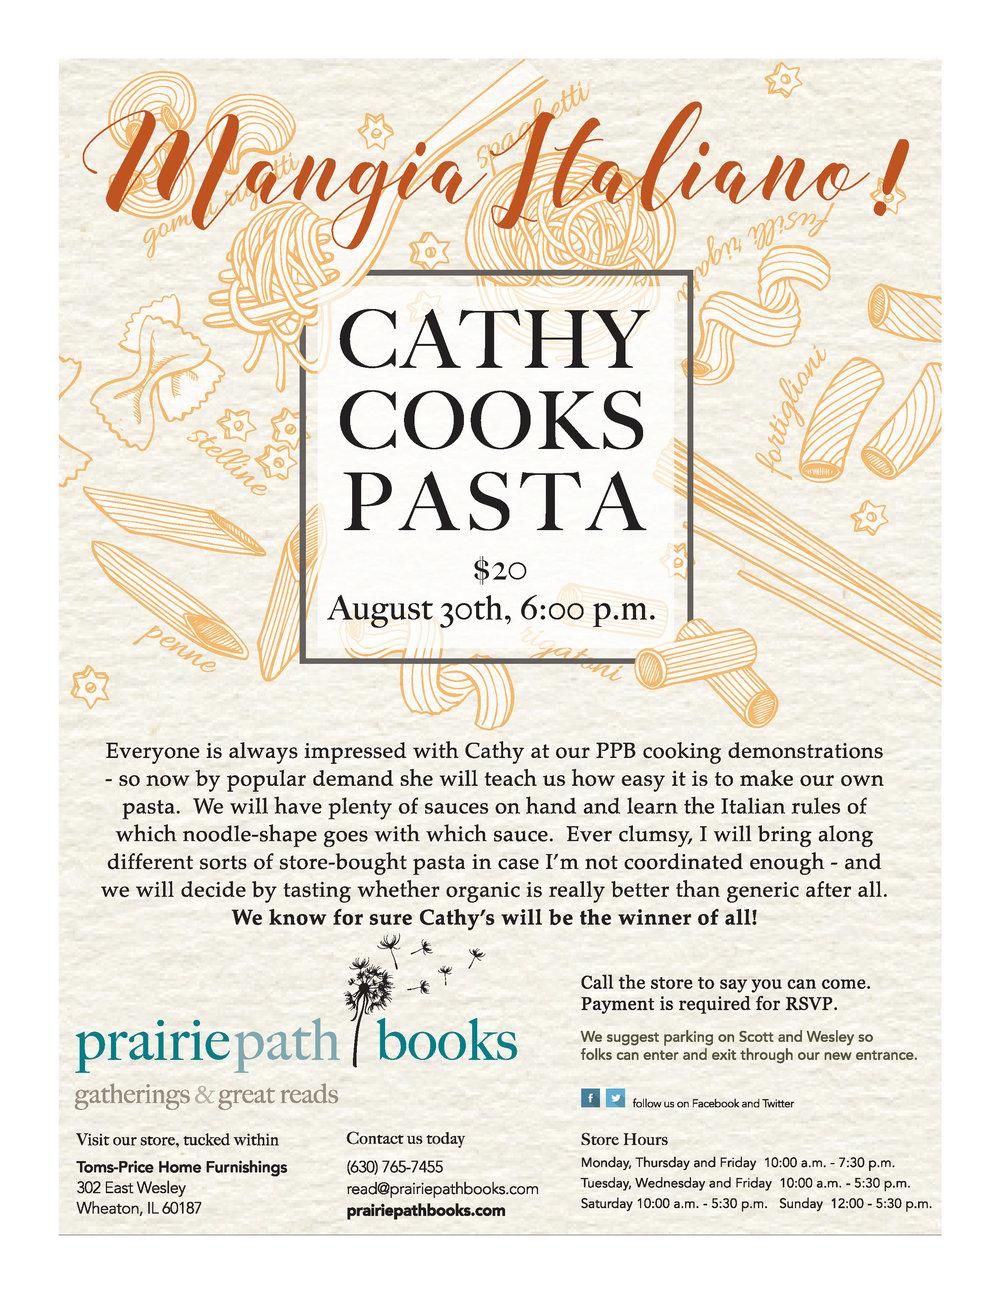 CathyCooksPasta_August30.jpg